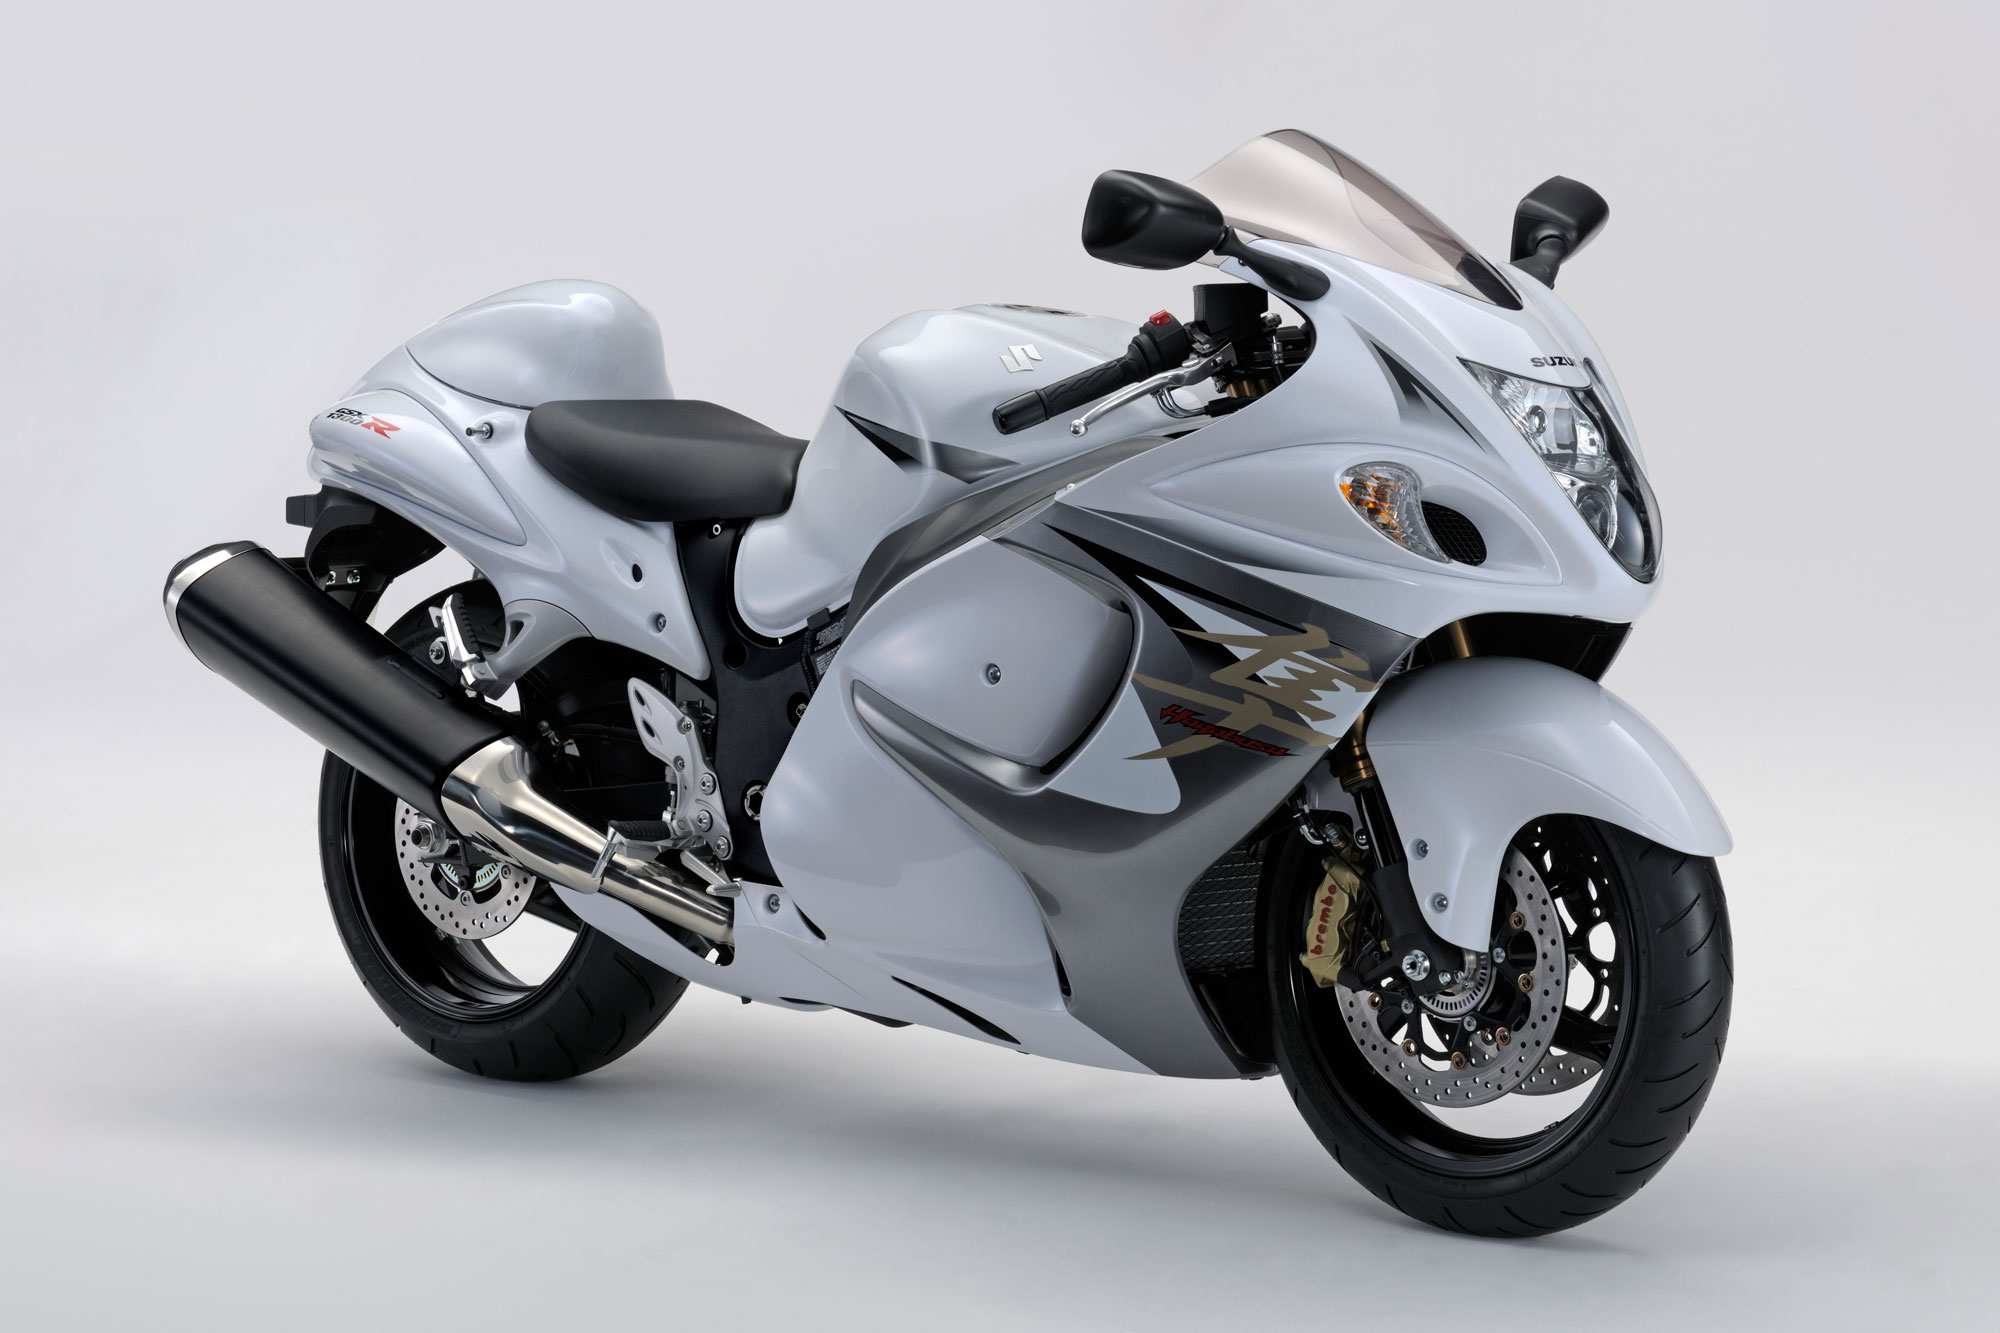 Suzuki Hayabusa replacement planned?